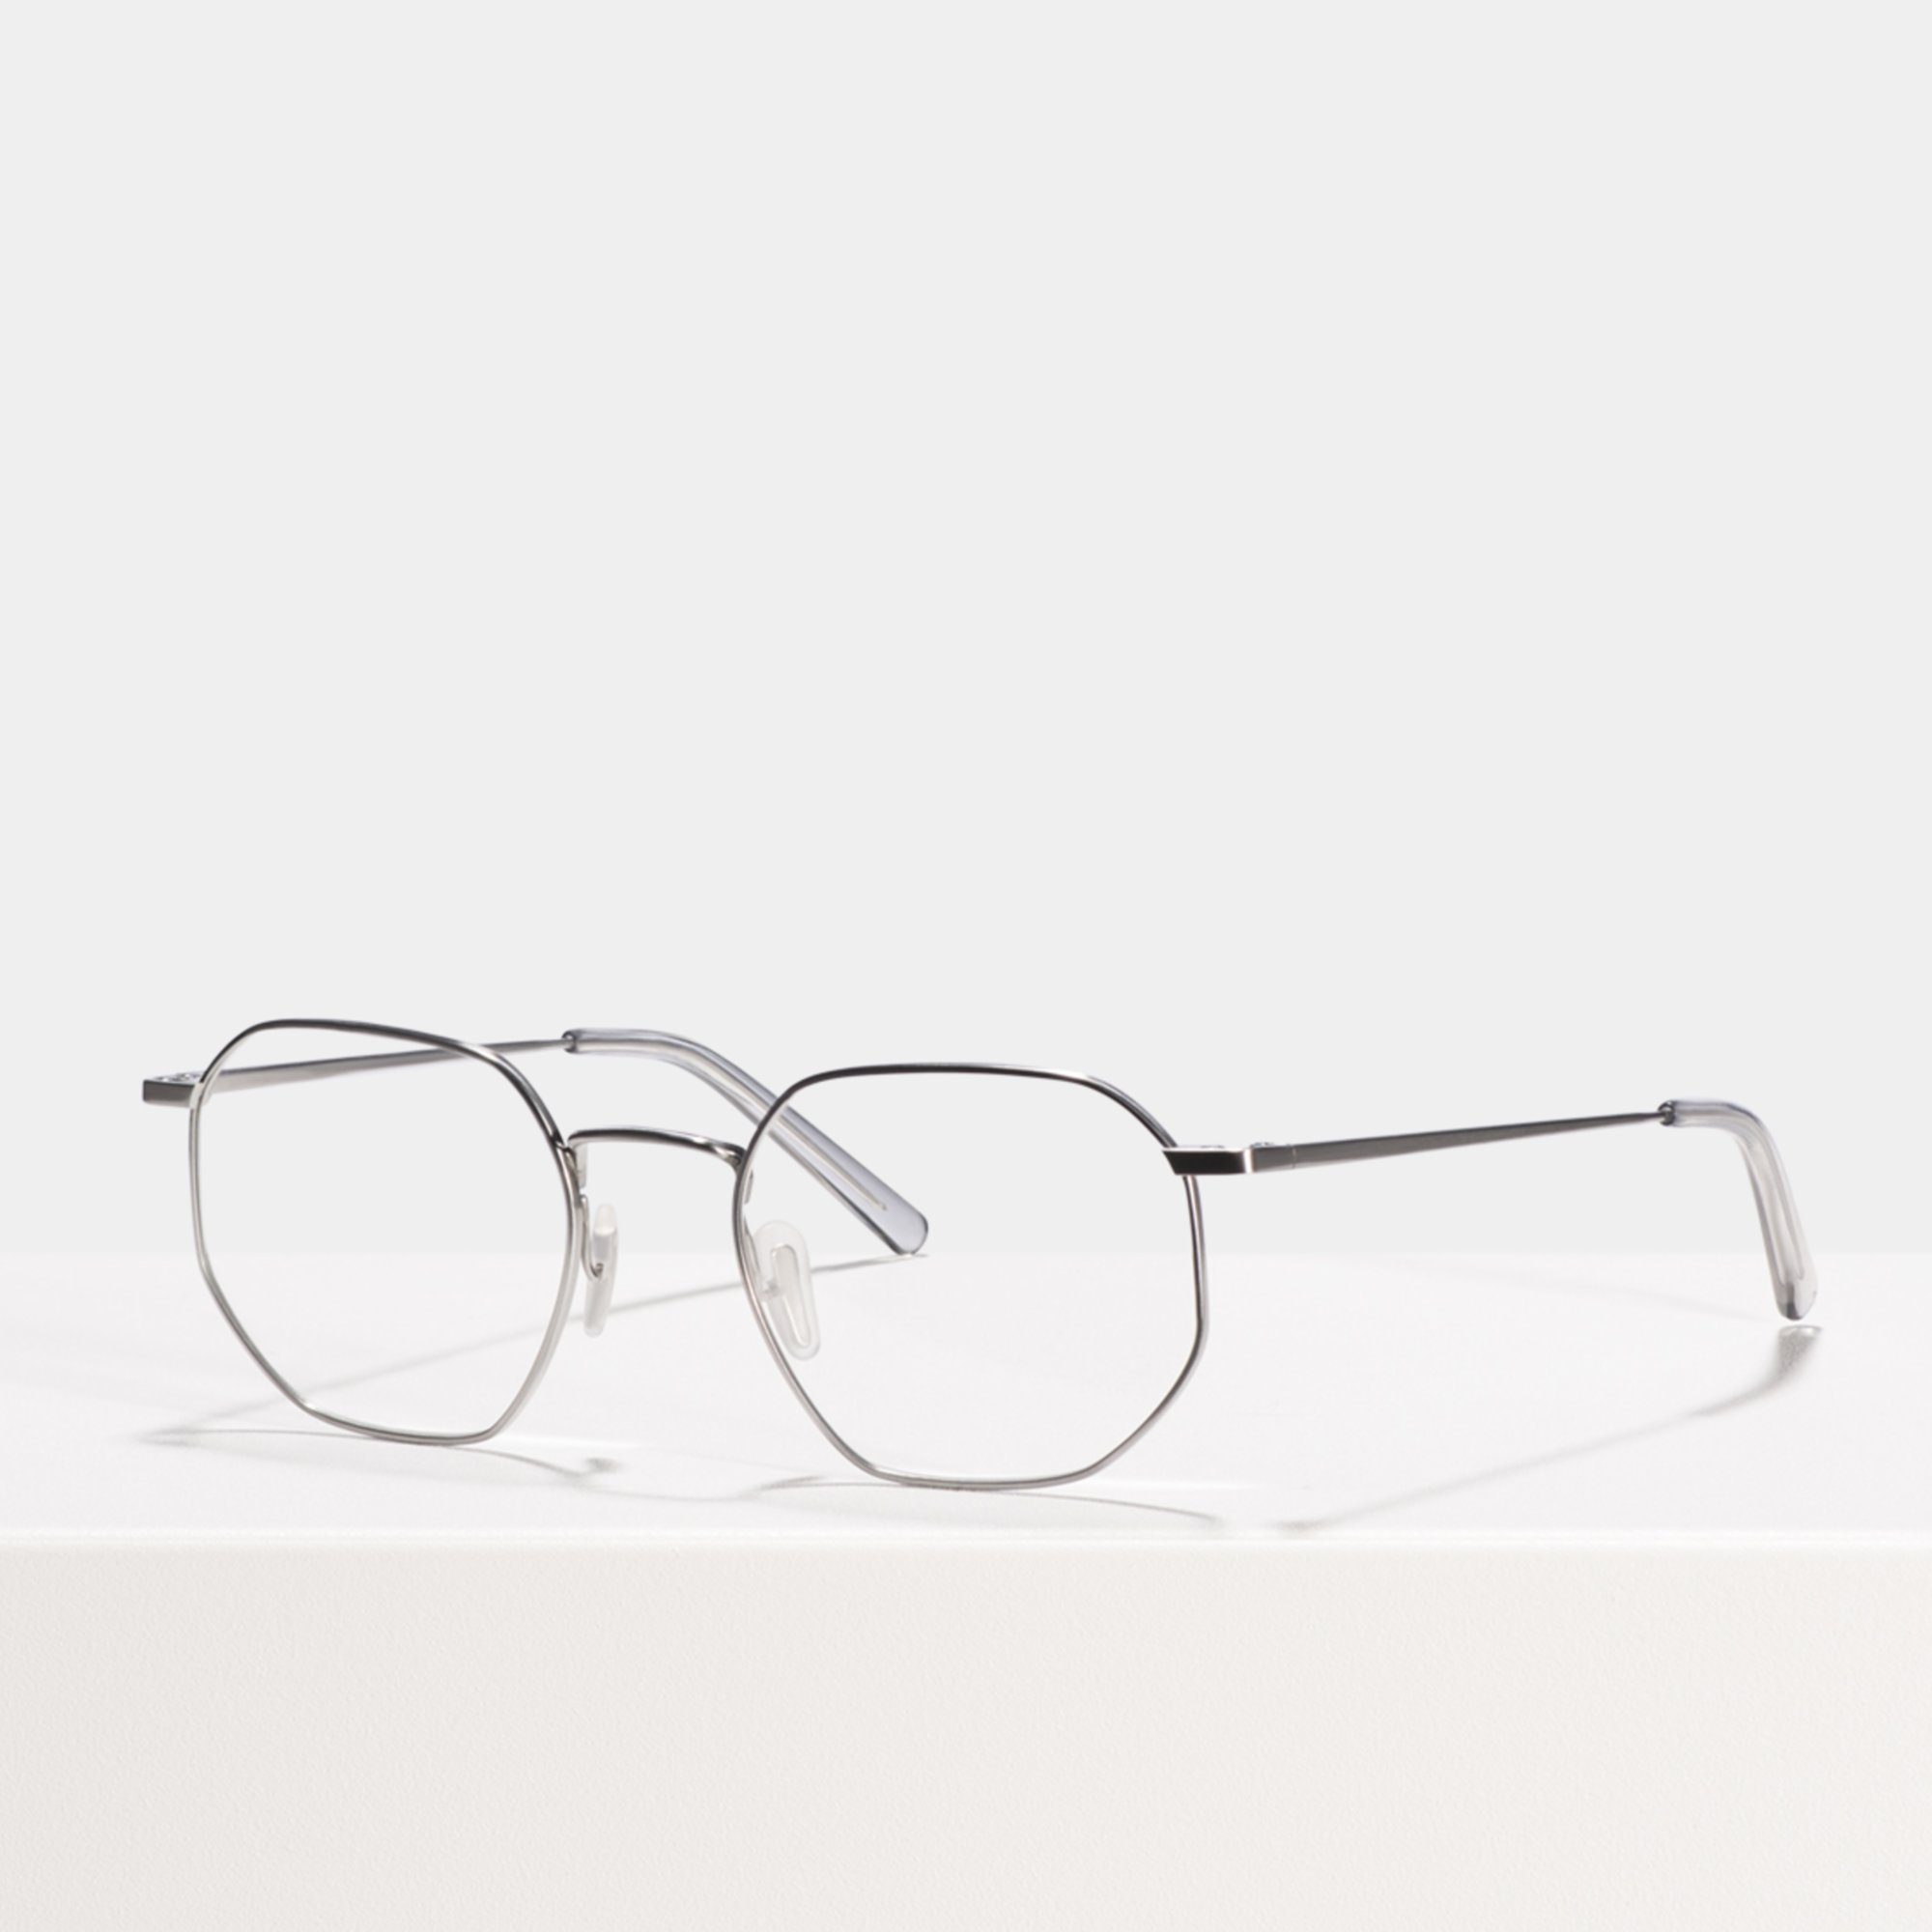 Ace & Tate Glasses |  titanium in Silver